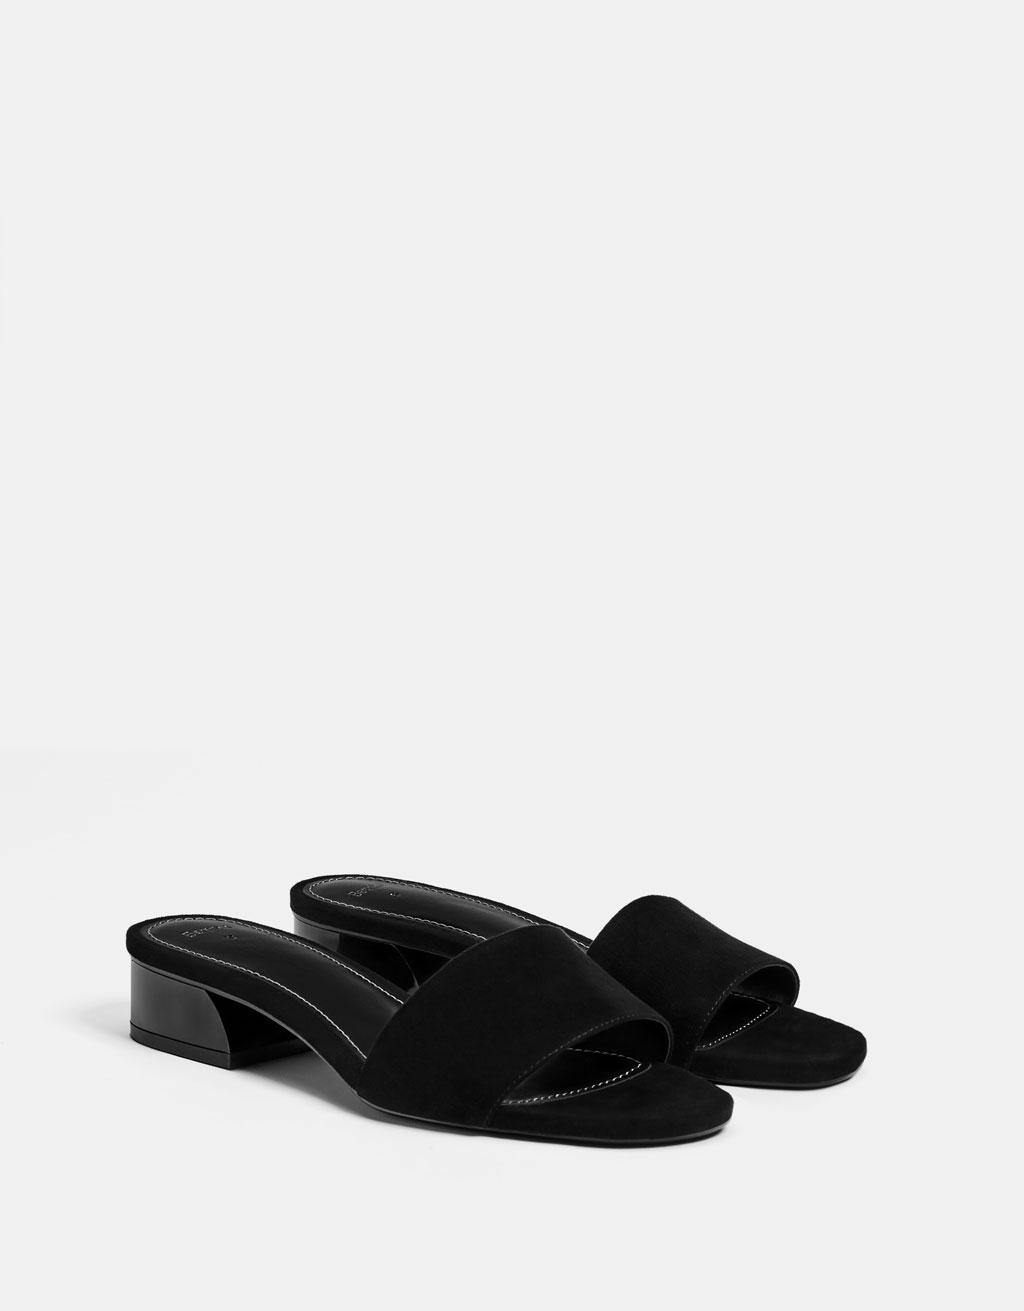 Orta boy topuklu terlik